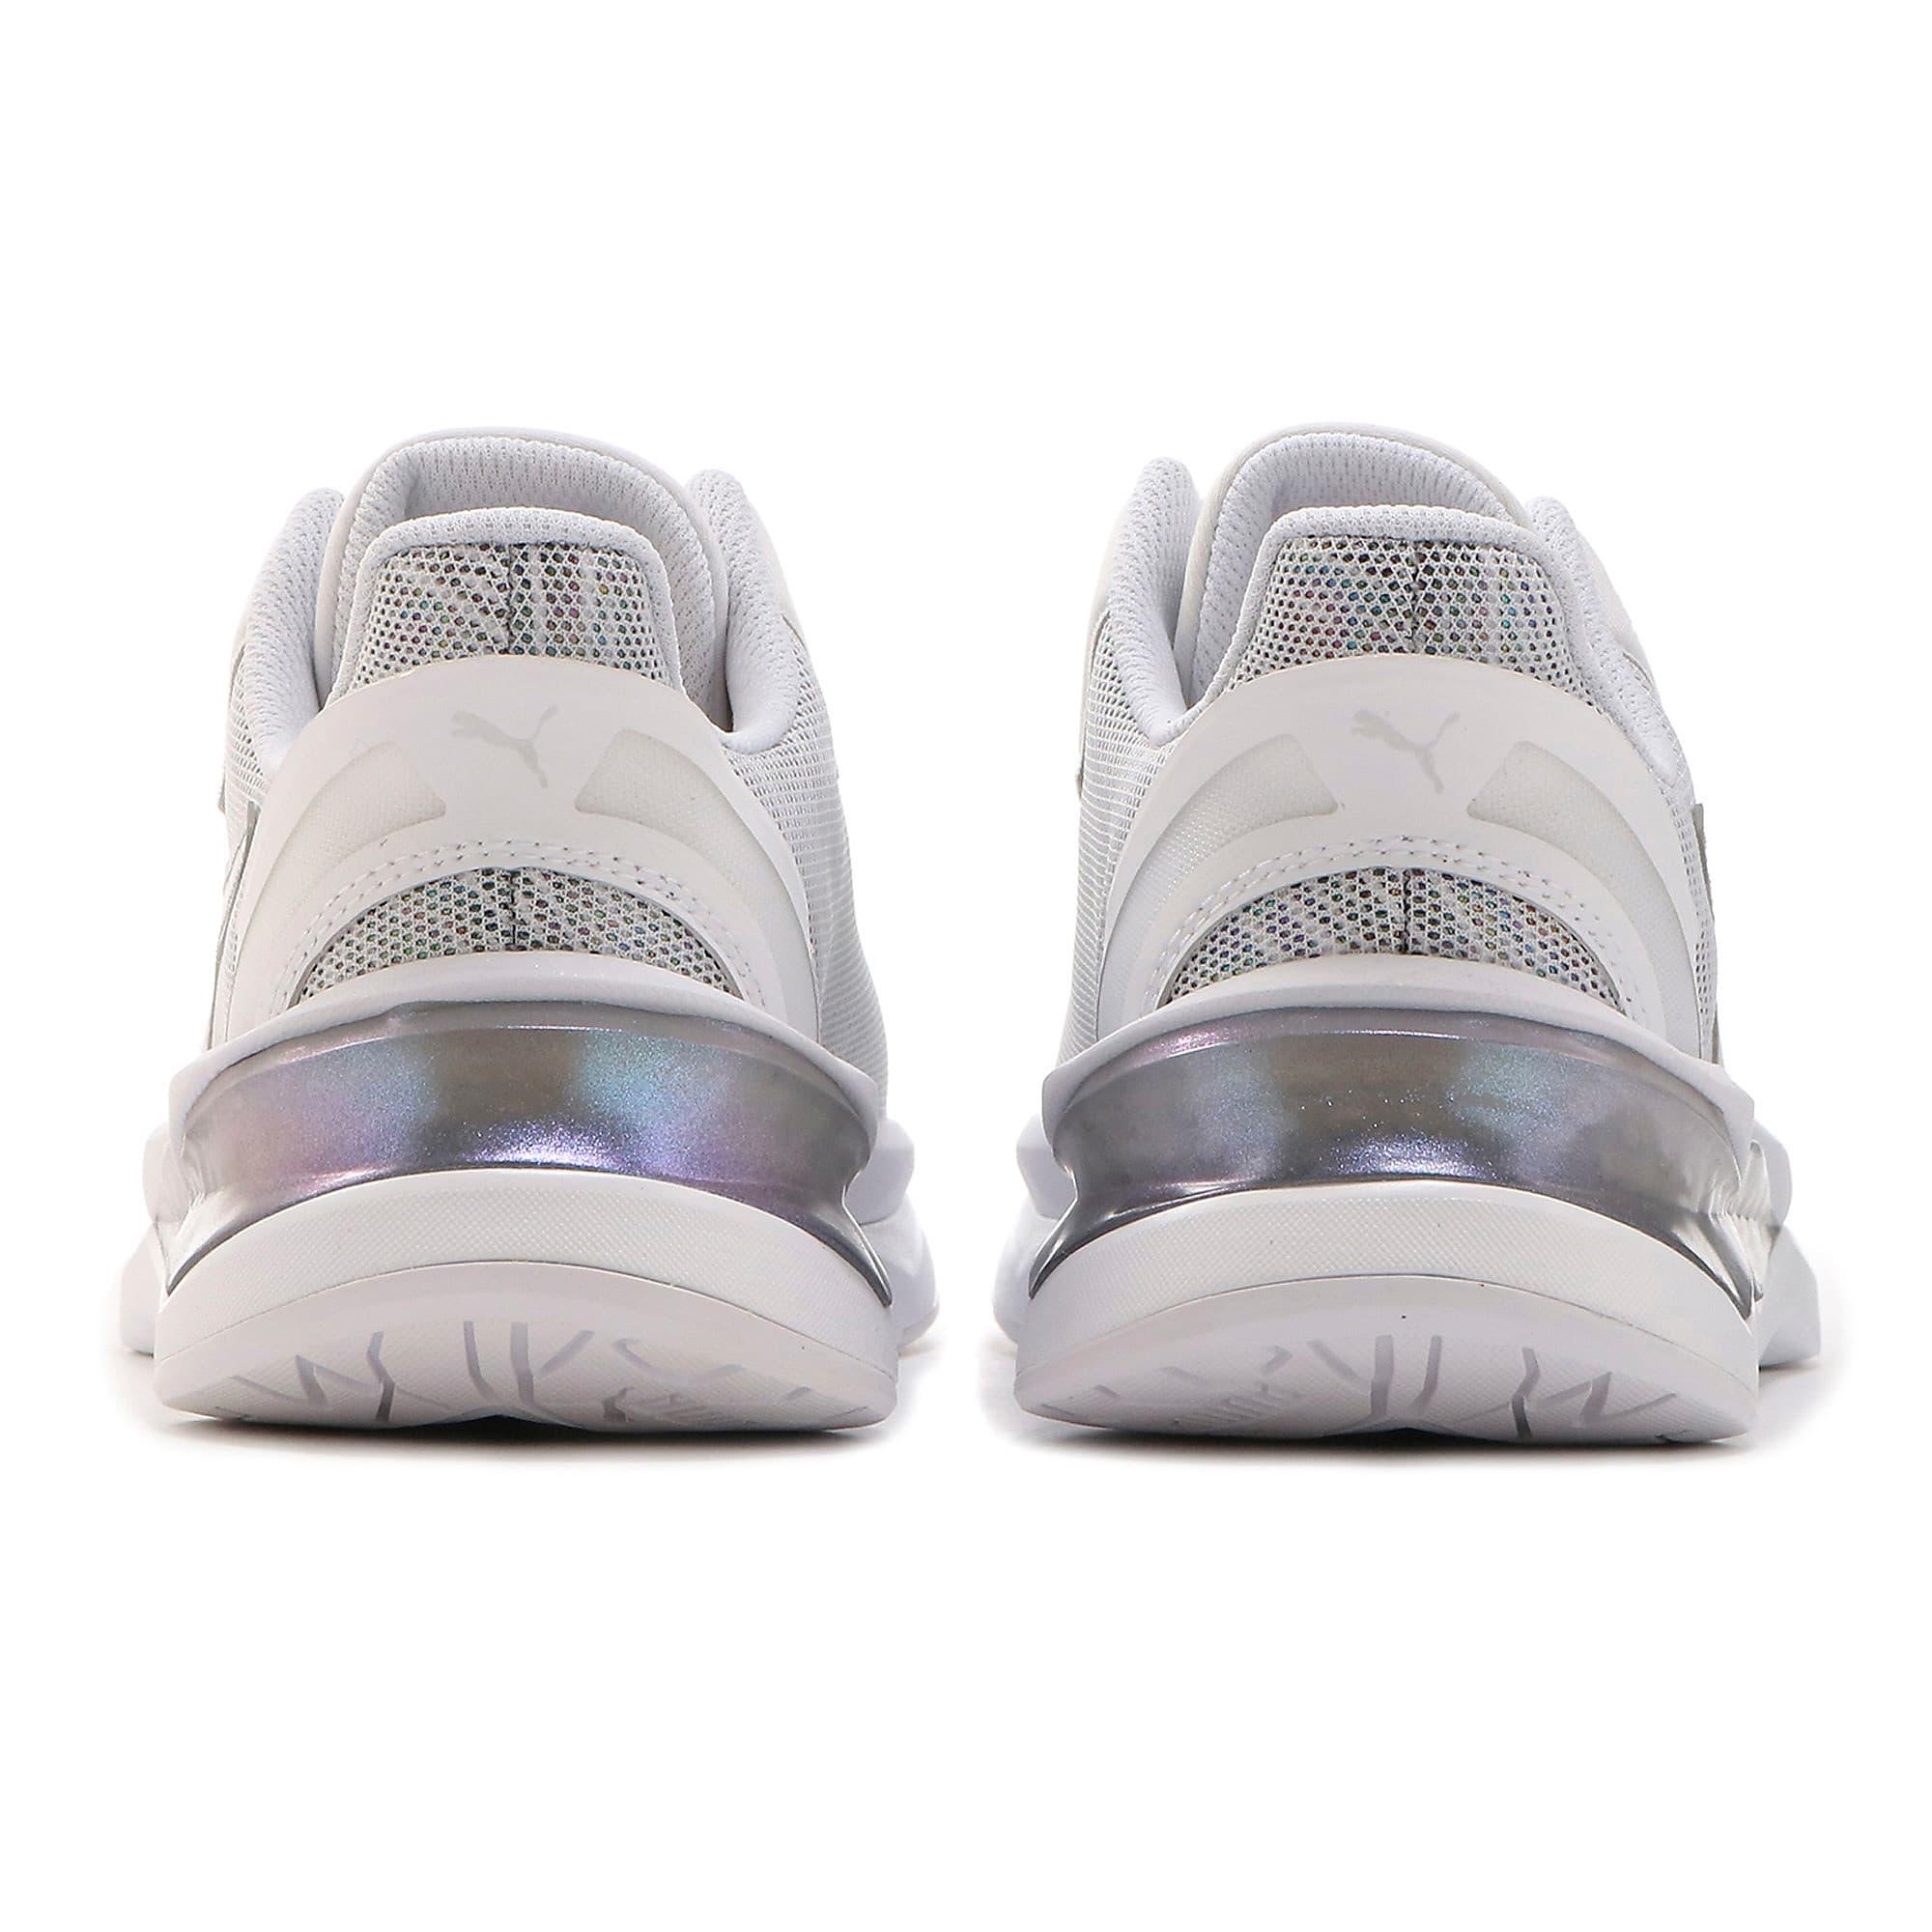 Thumbnail 3 of LQDCELL Shatter XT Luster Women's Training Shoes, Puma White-Puma White, medium